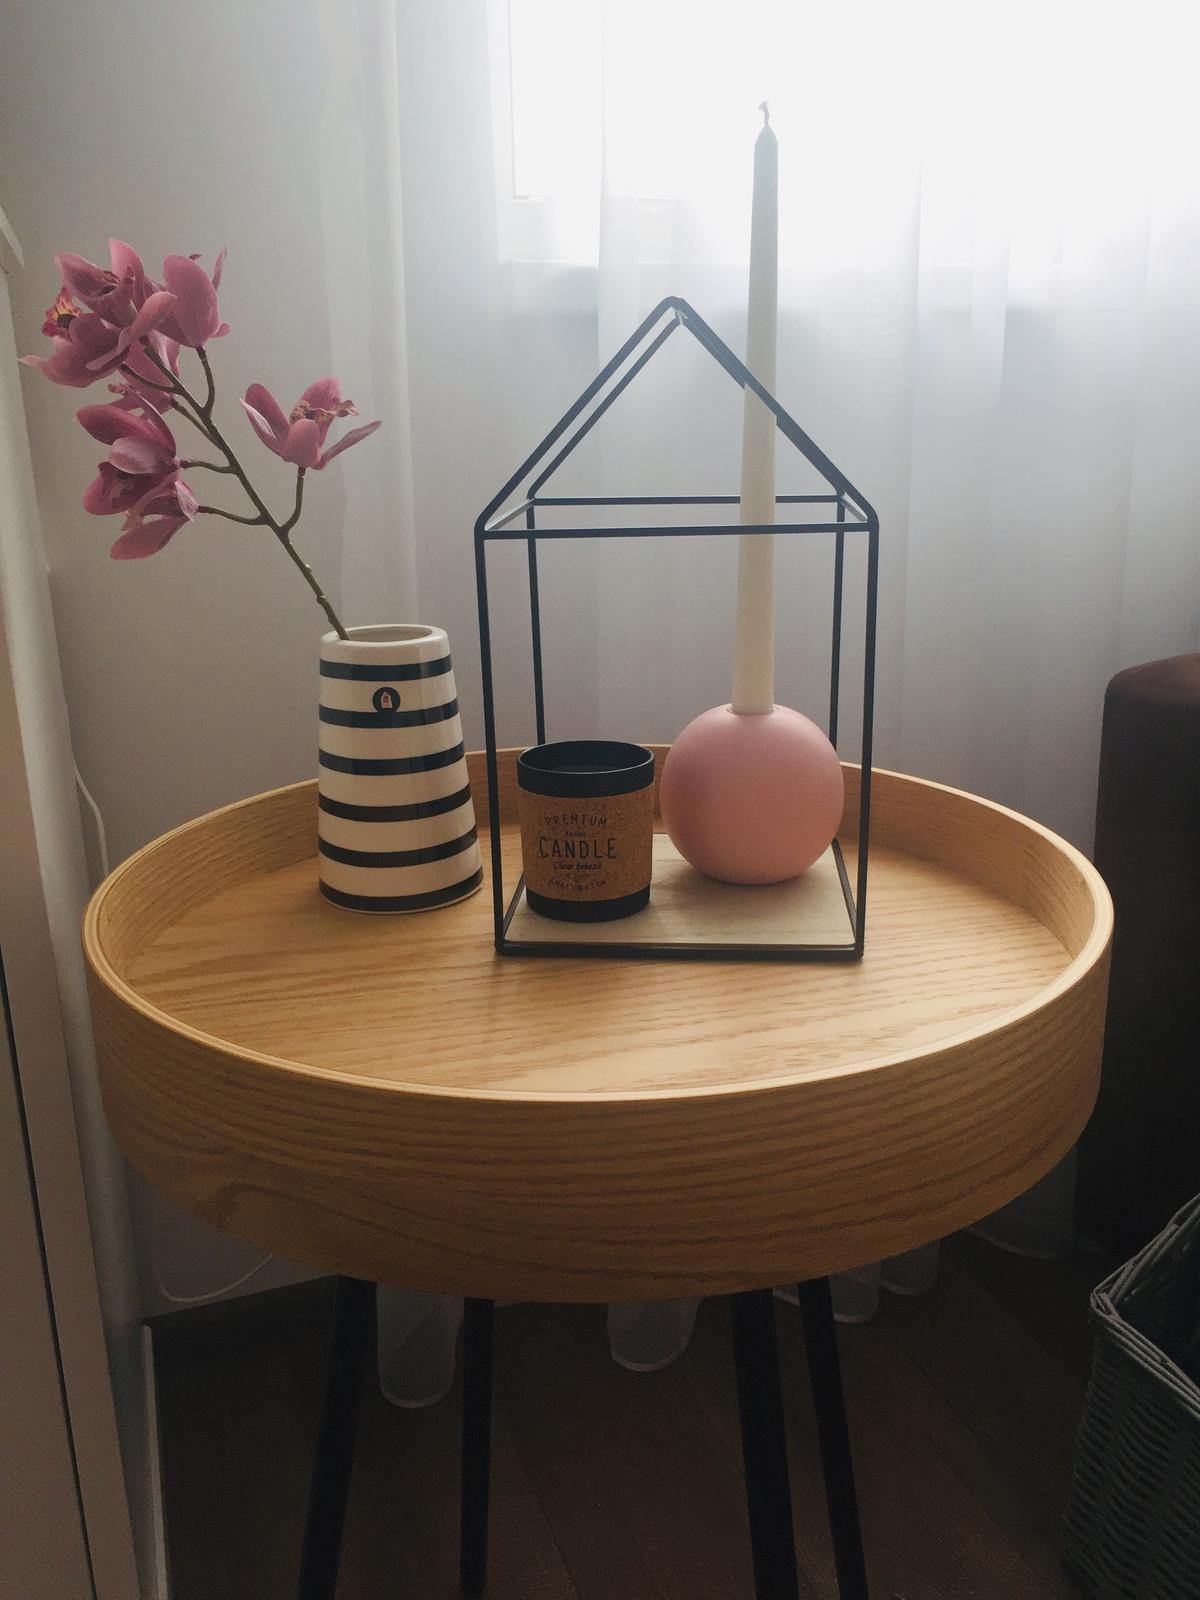 S Haus - Stolík a dekorky